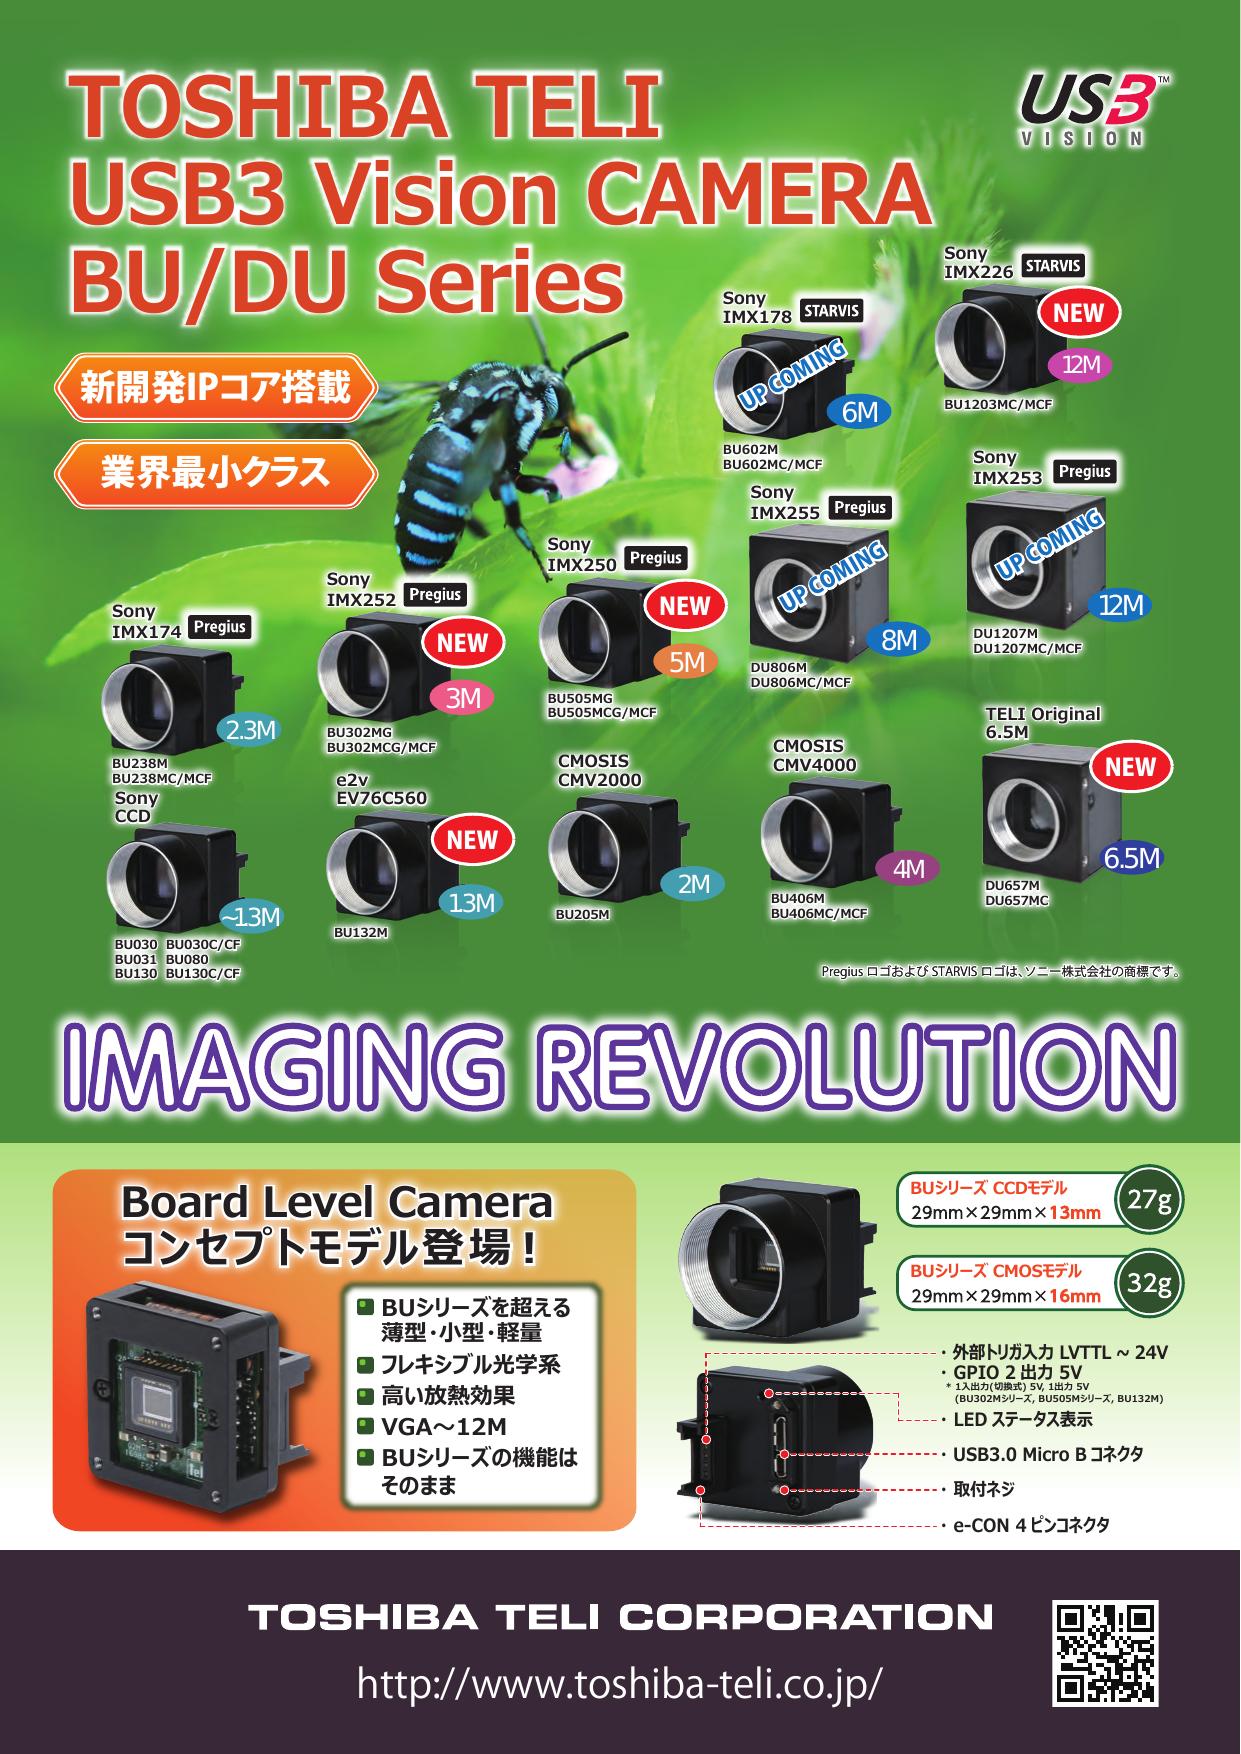 USB3 Vision CAMERA BU/DU Series